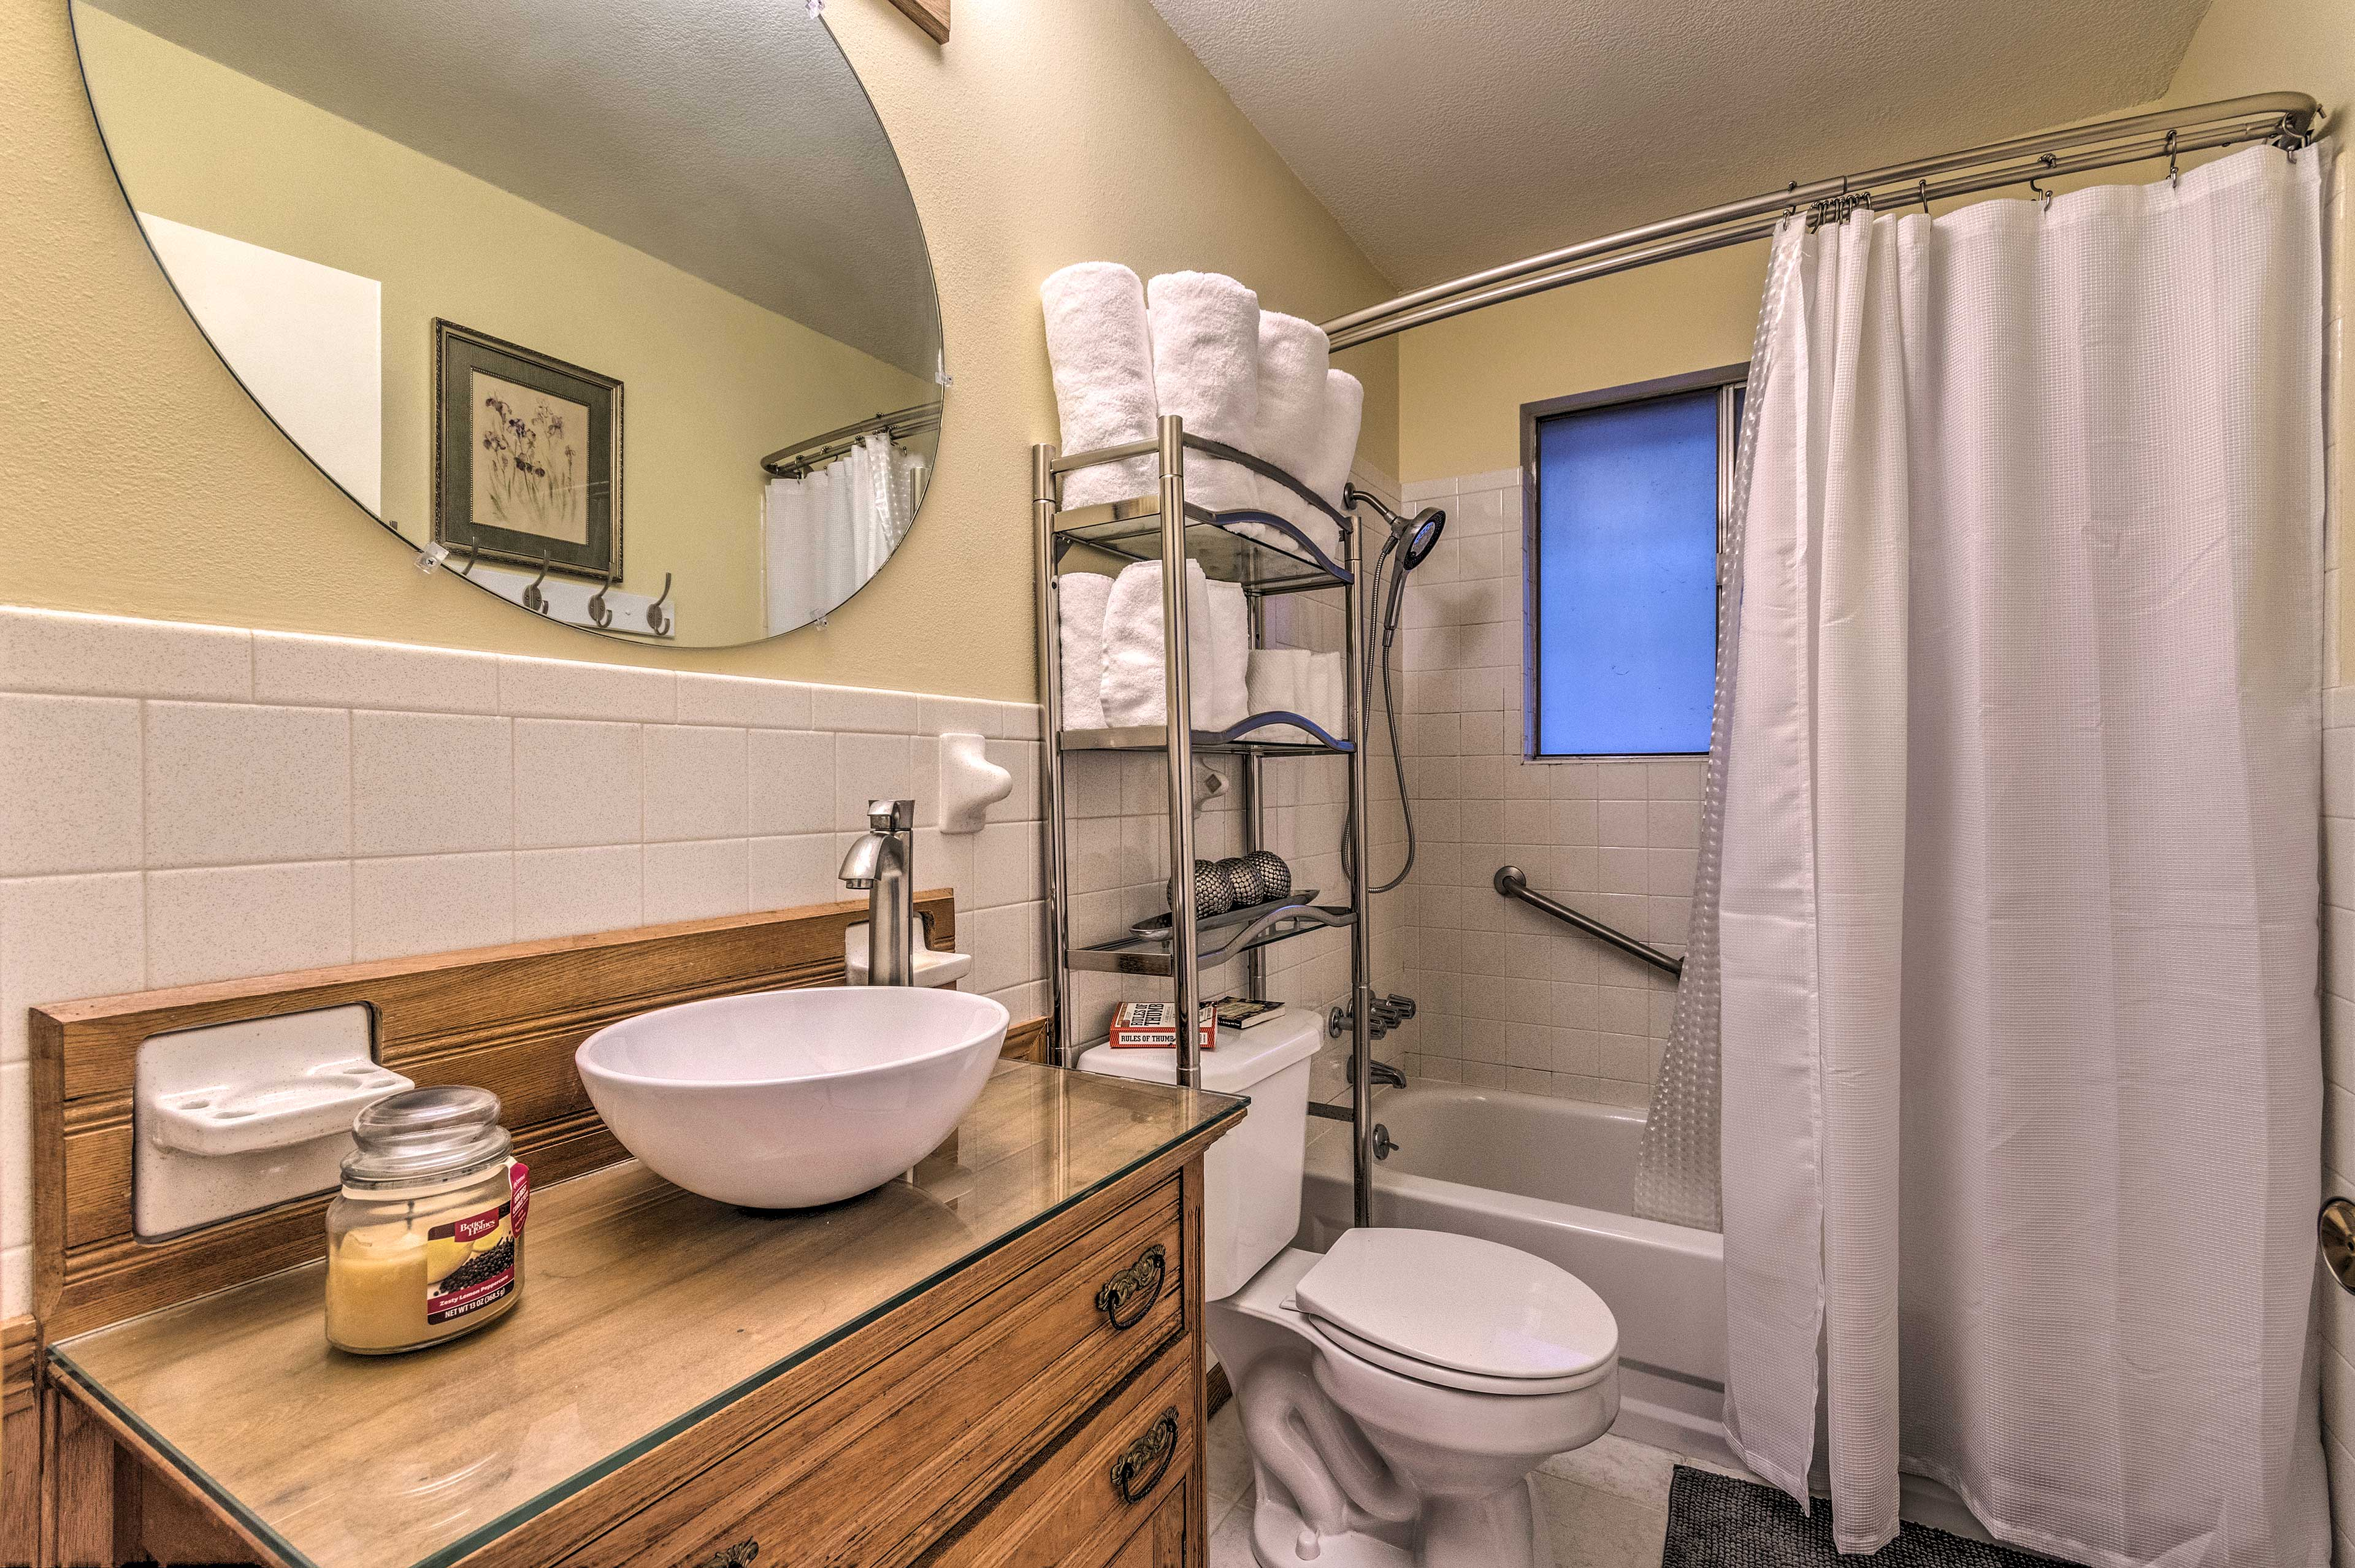 Freshen up in this elegant bathroom.